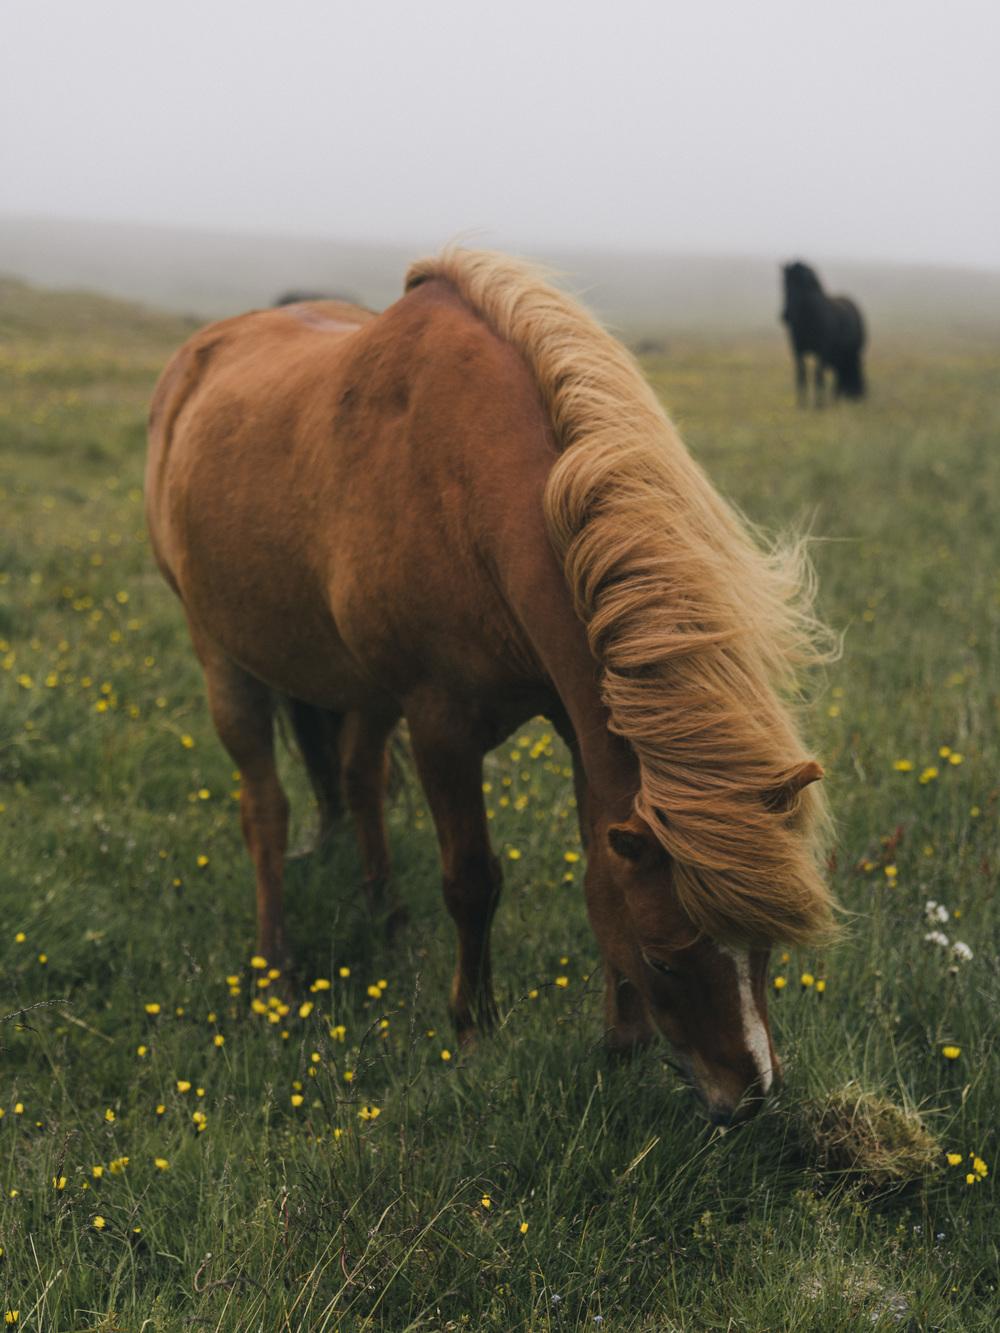 the icelandic countryside.  |7.22.16| Grundarfjordur, Iceland